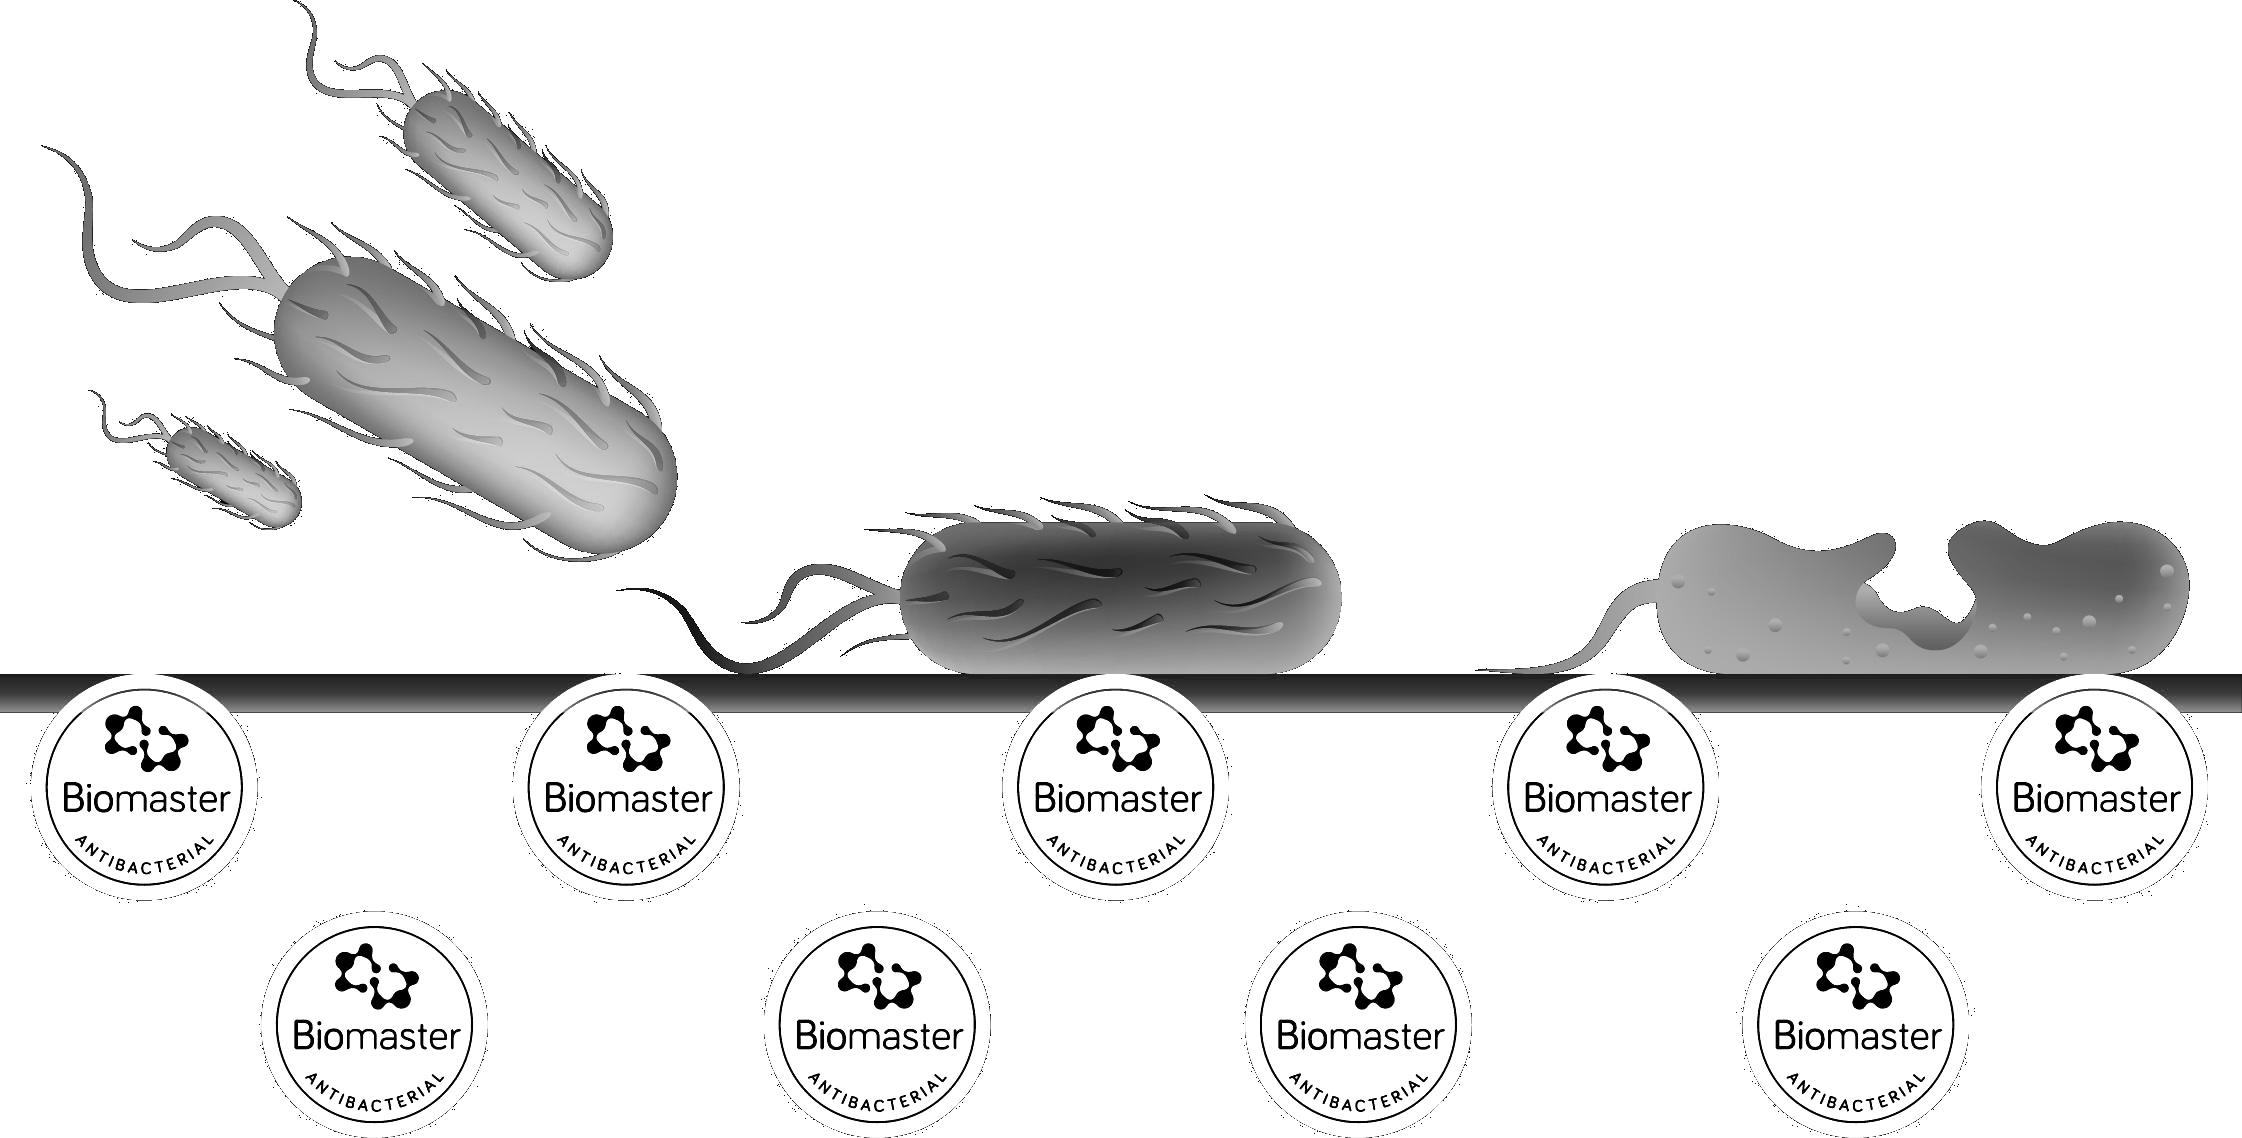 Biomaster-surface